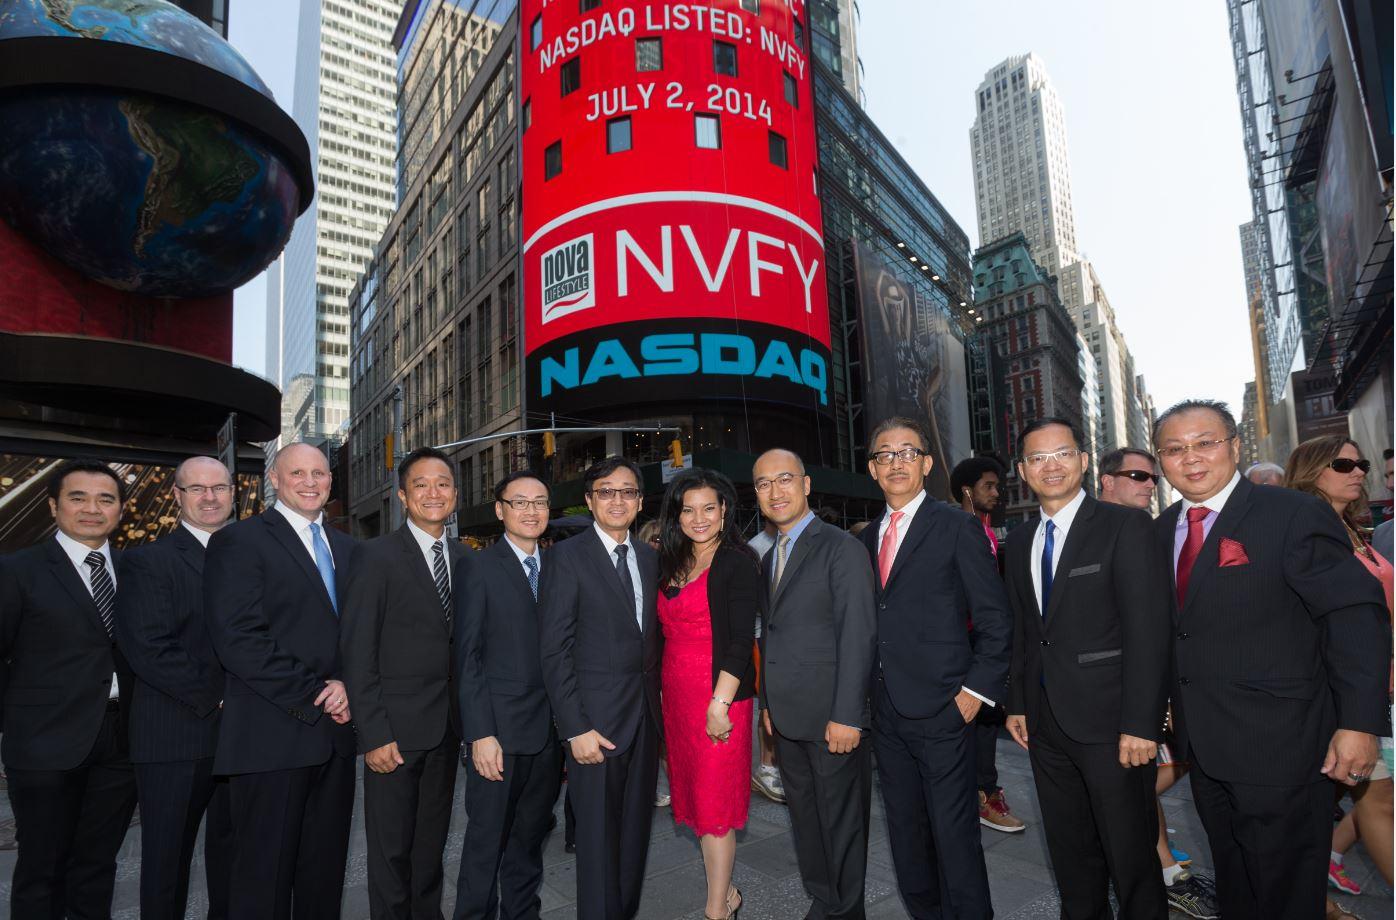 NASDAQ Bell Ceremony, Times Square, NY July 2, 2014